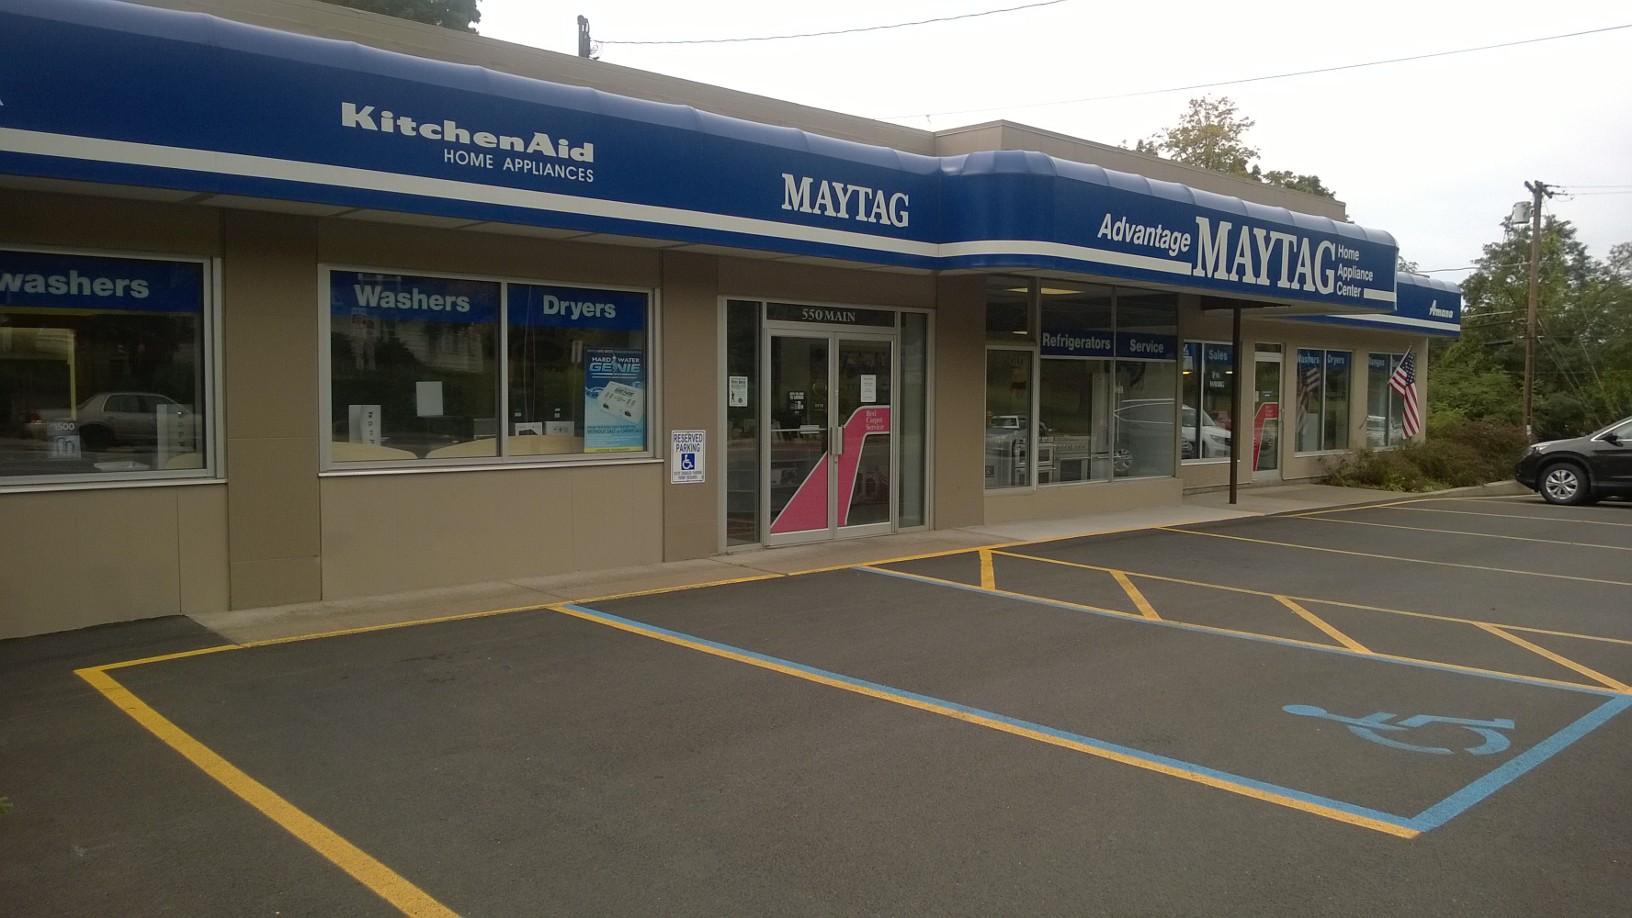 Advantage Maytag Home Appliance Center